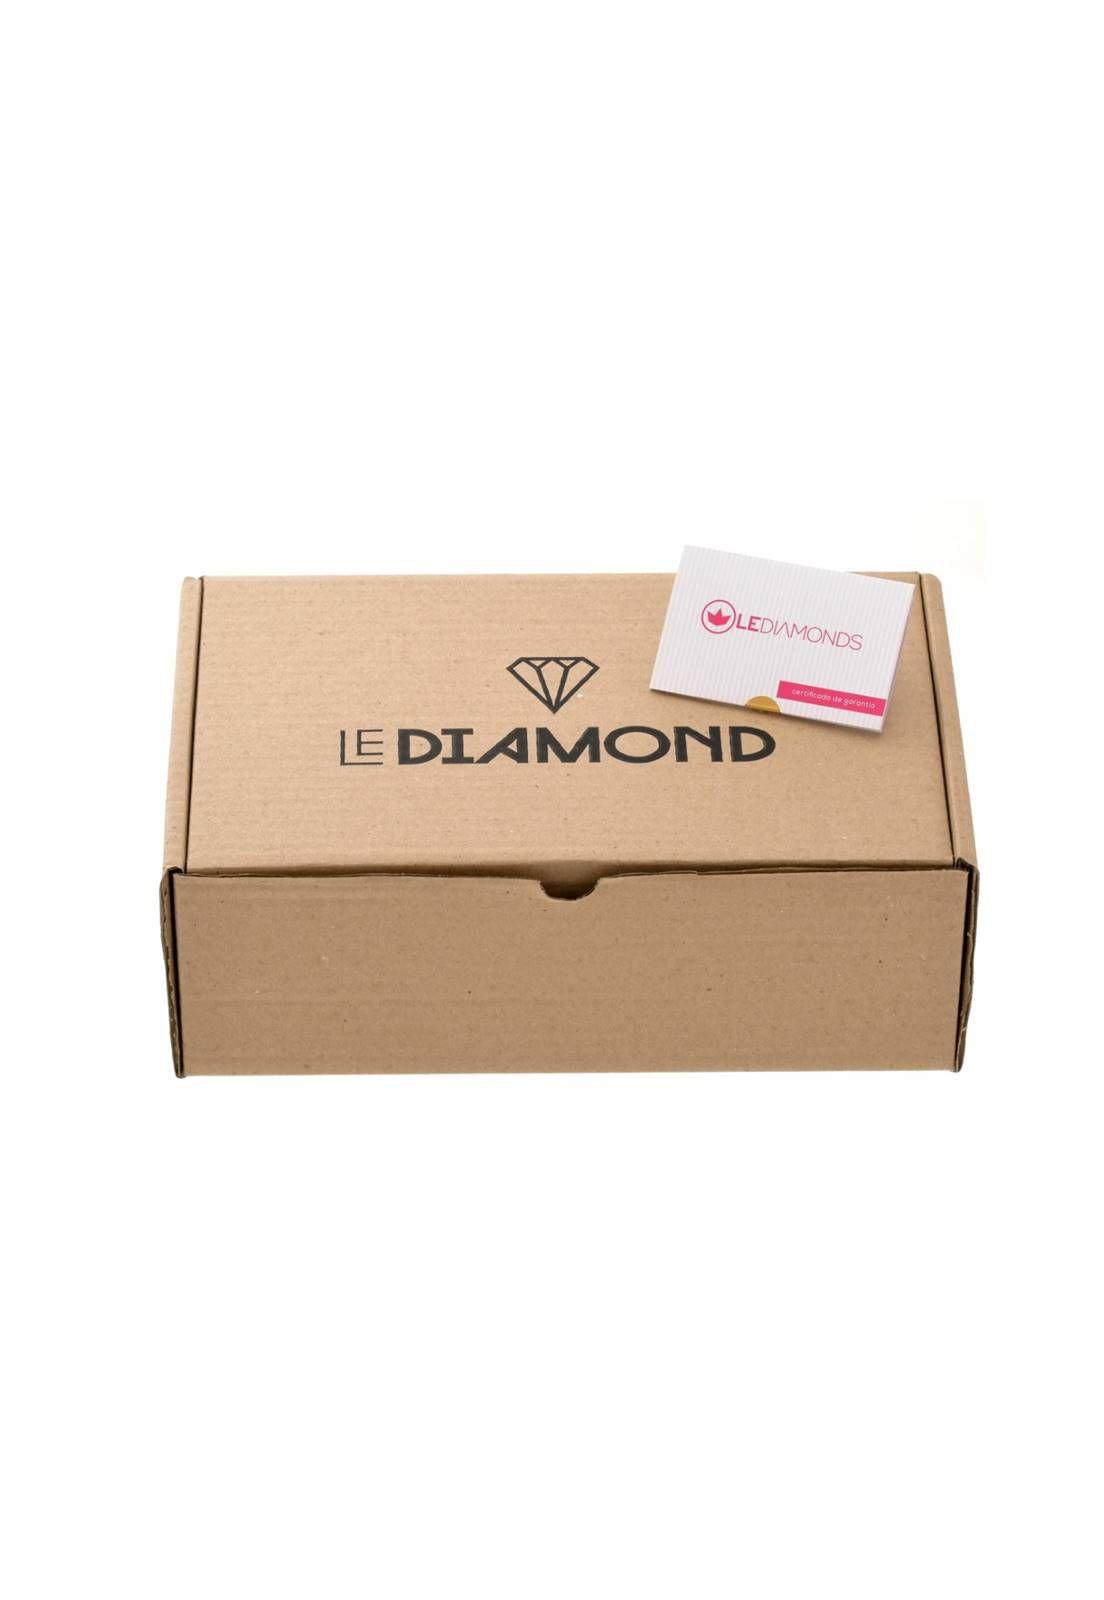 Colar Le Diamond Lady Bolas Fios De Seda Dourado